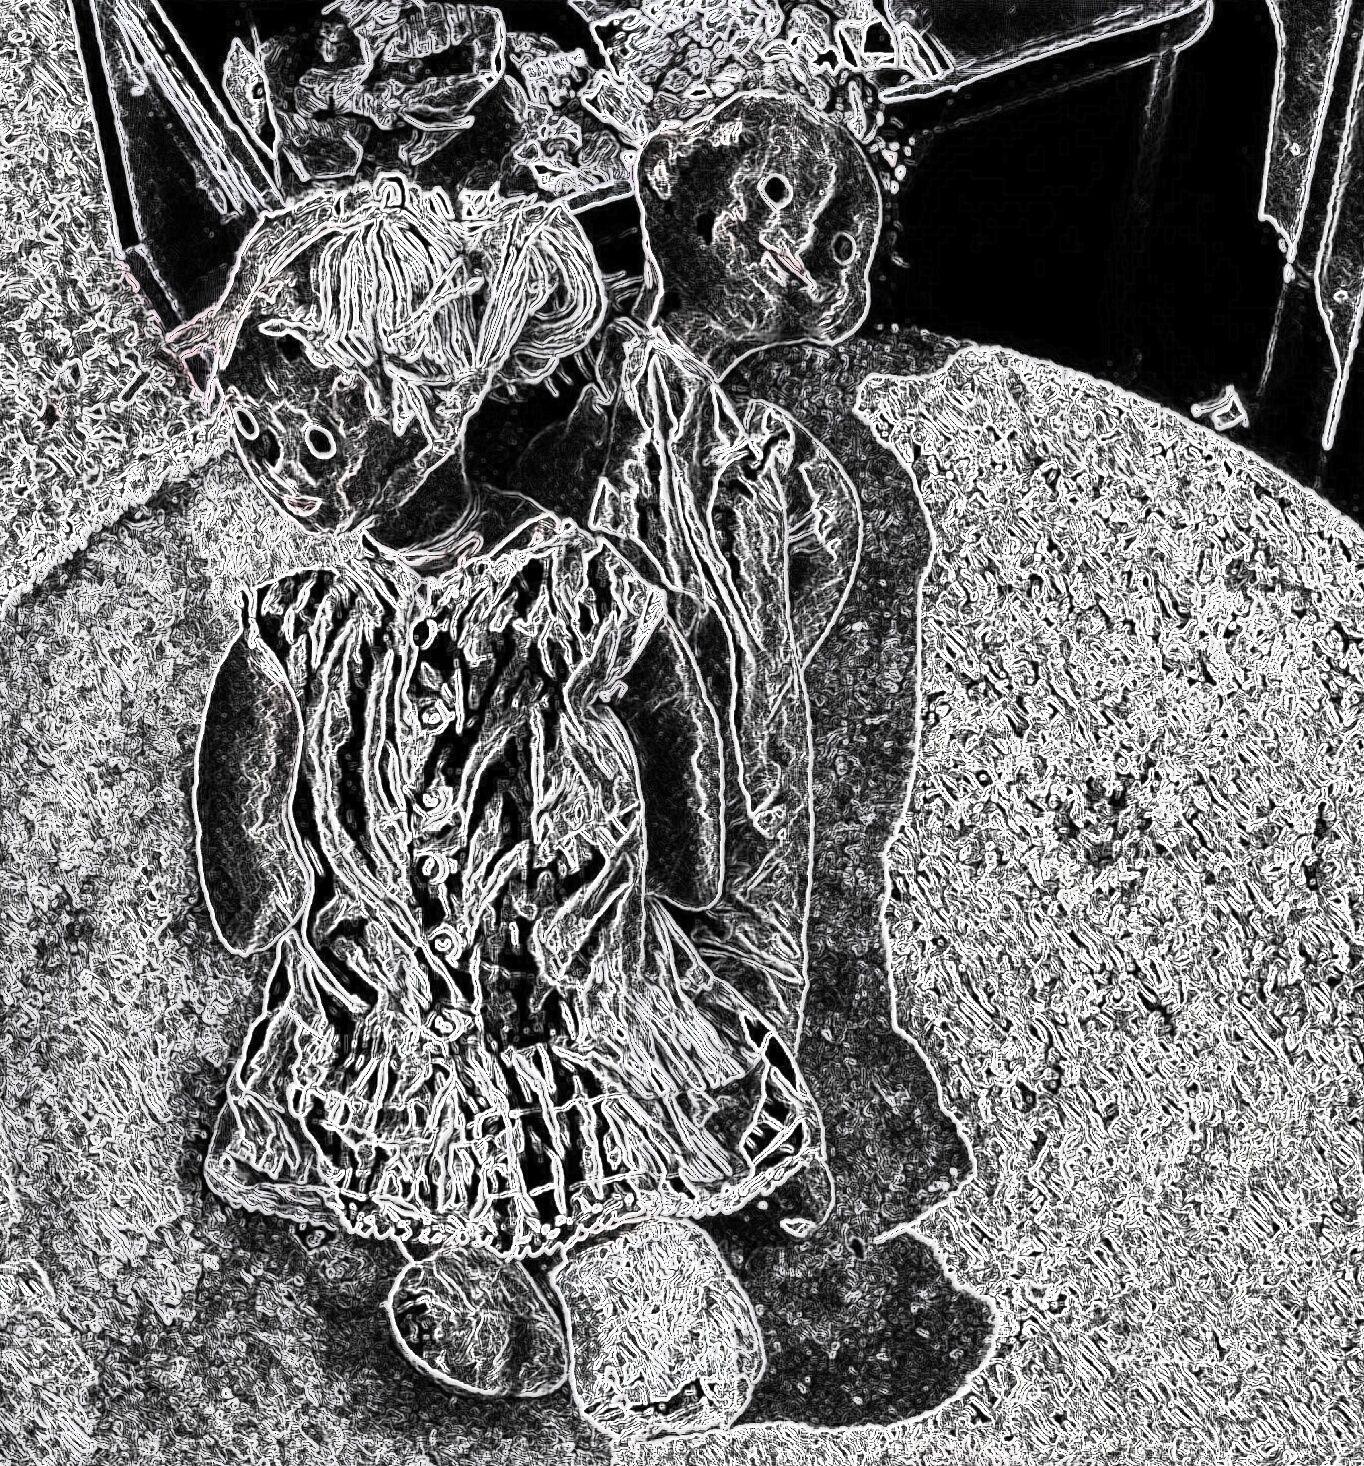 PaperCamera2019-10-10-22-04-02.jpg